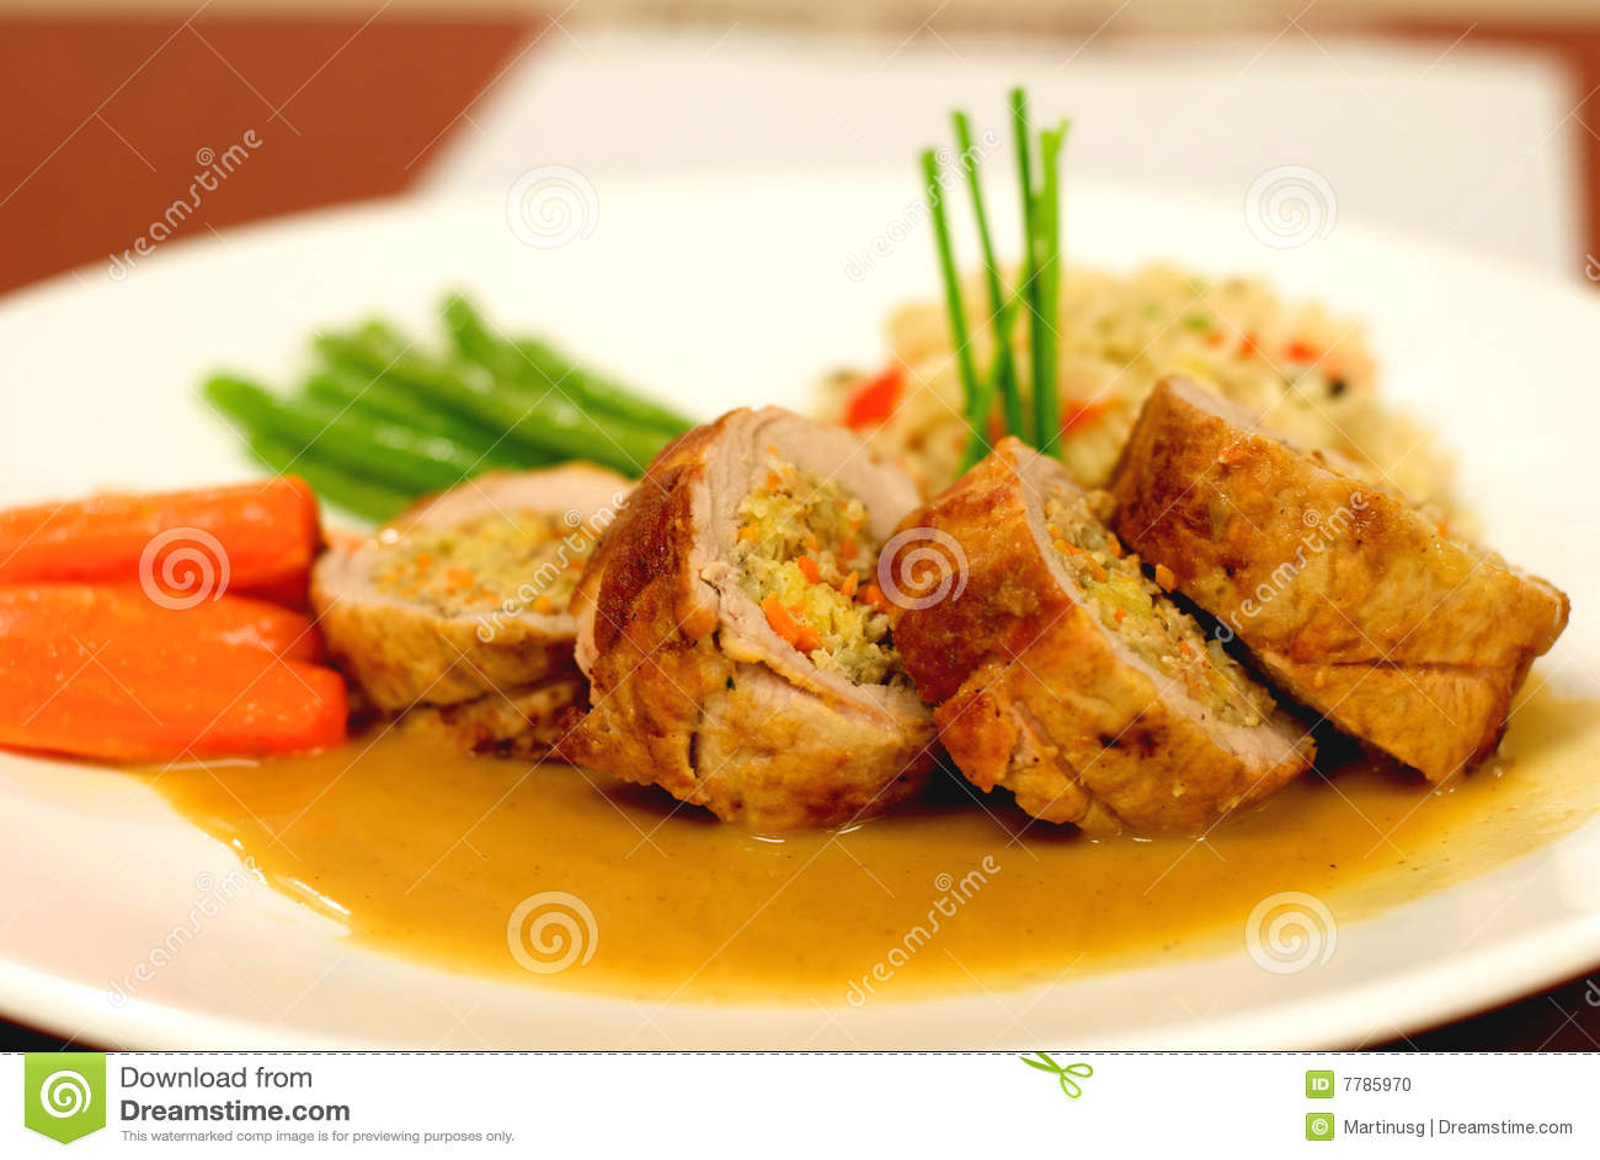 Fancy Food 2 Stock Photo - Image: 7785970